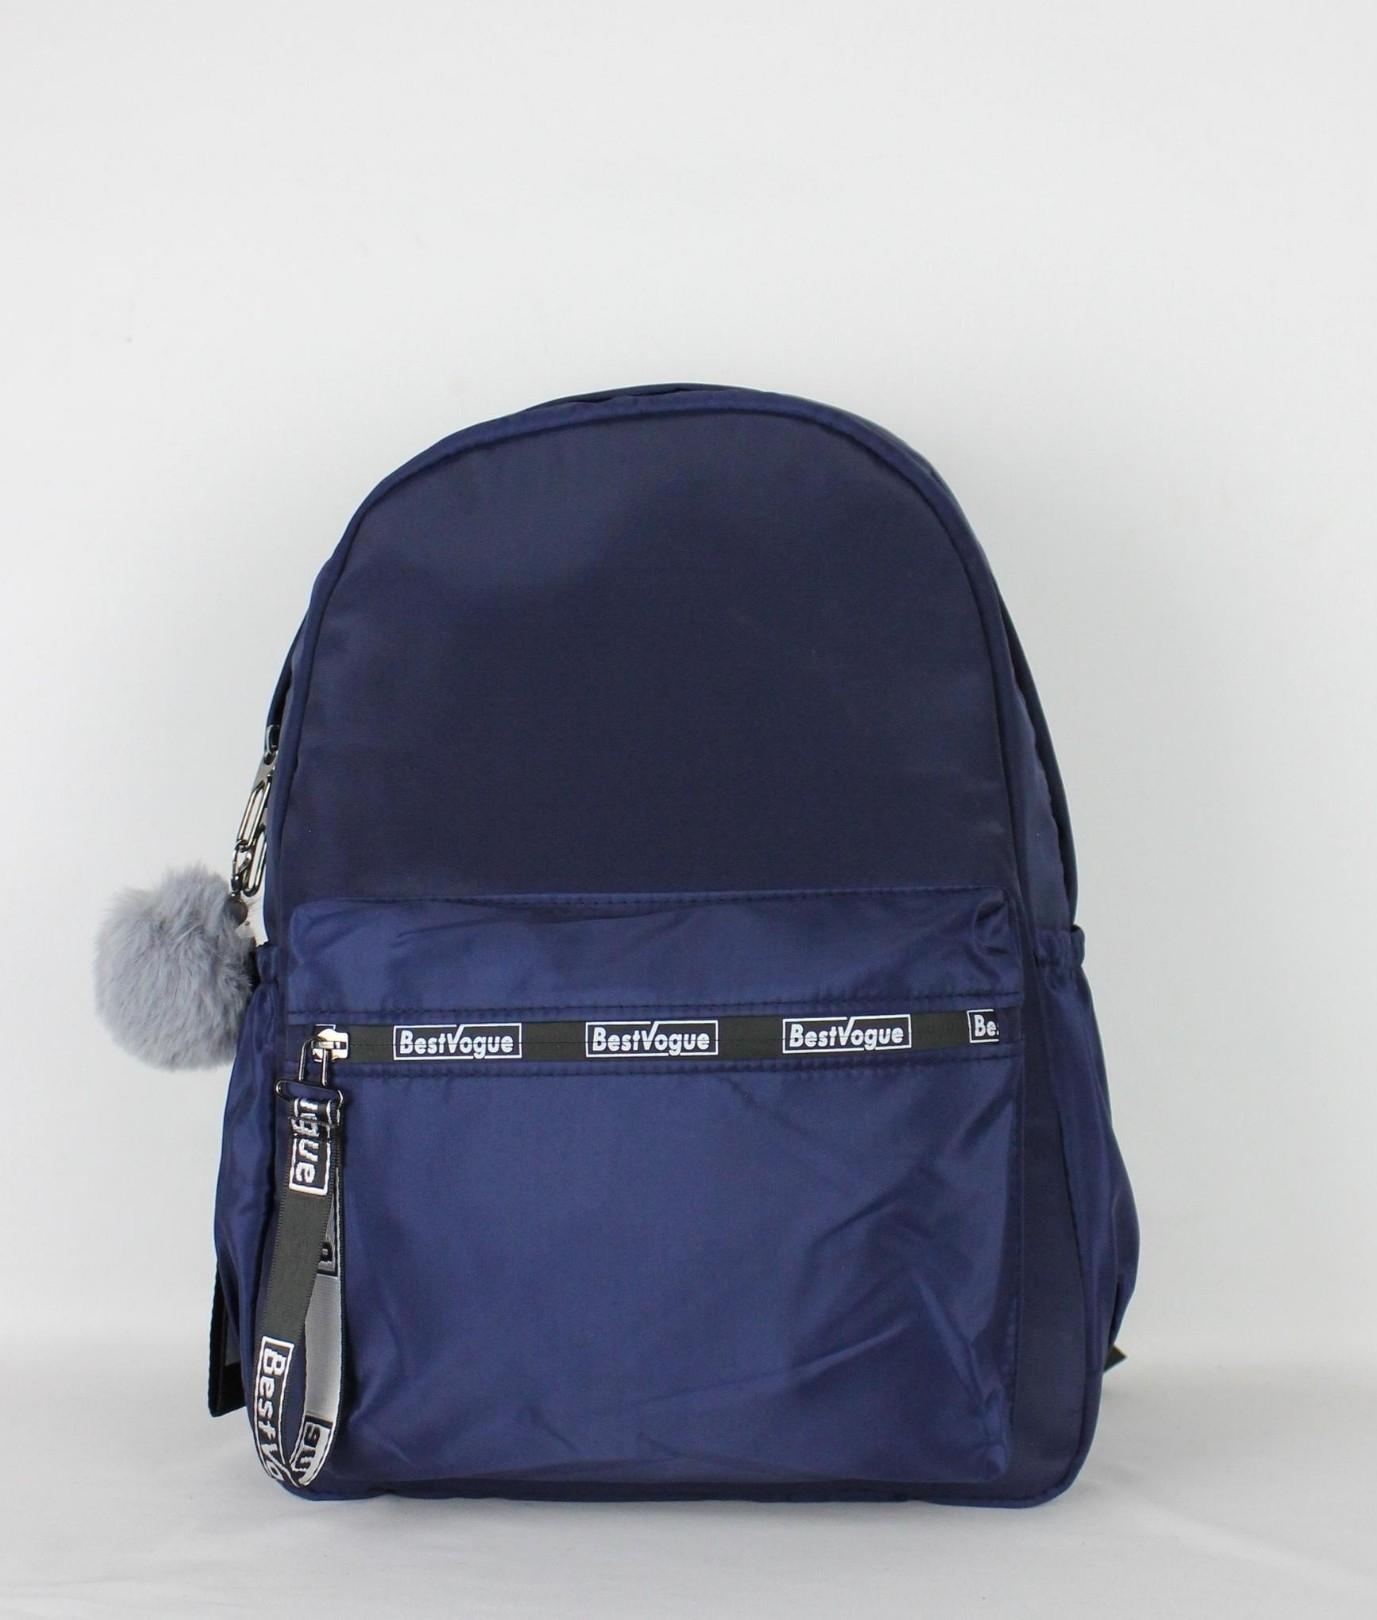 Mochila Vogue - Azul Marino